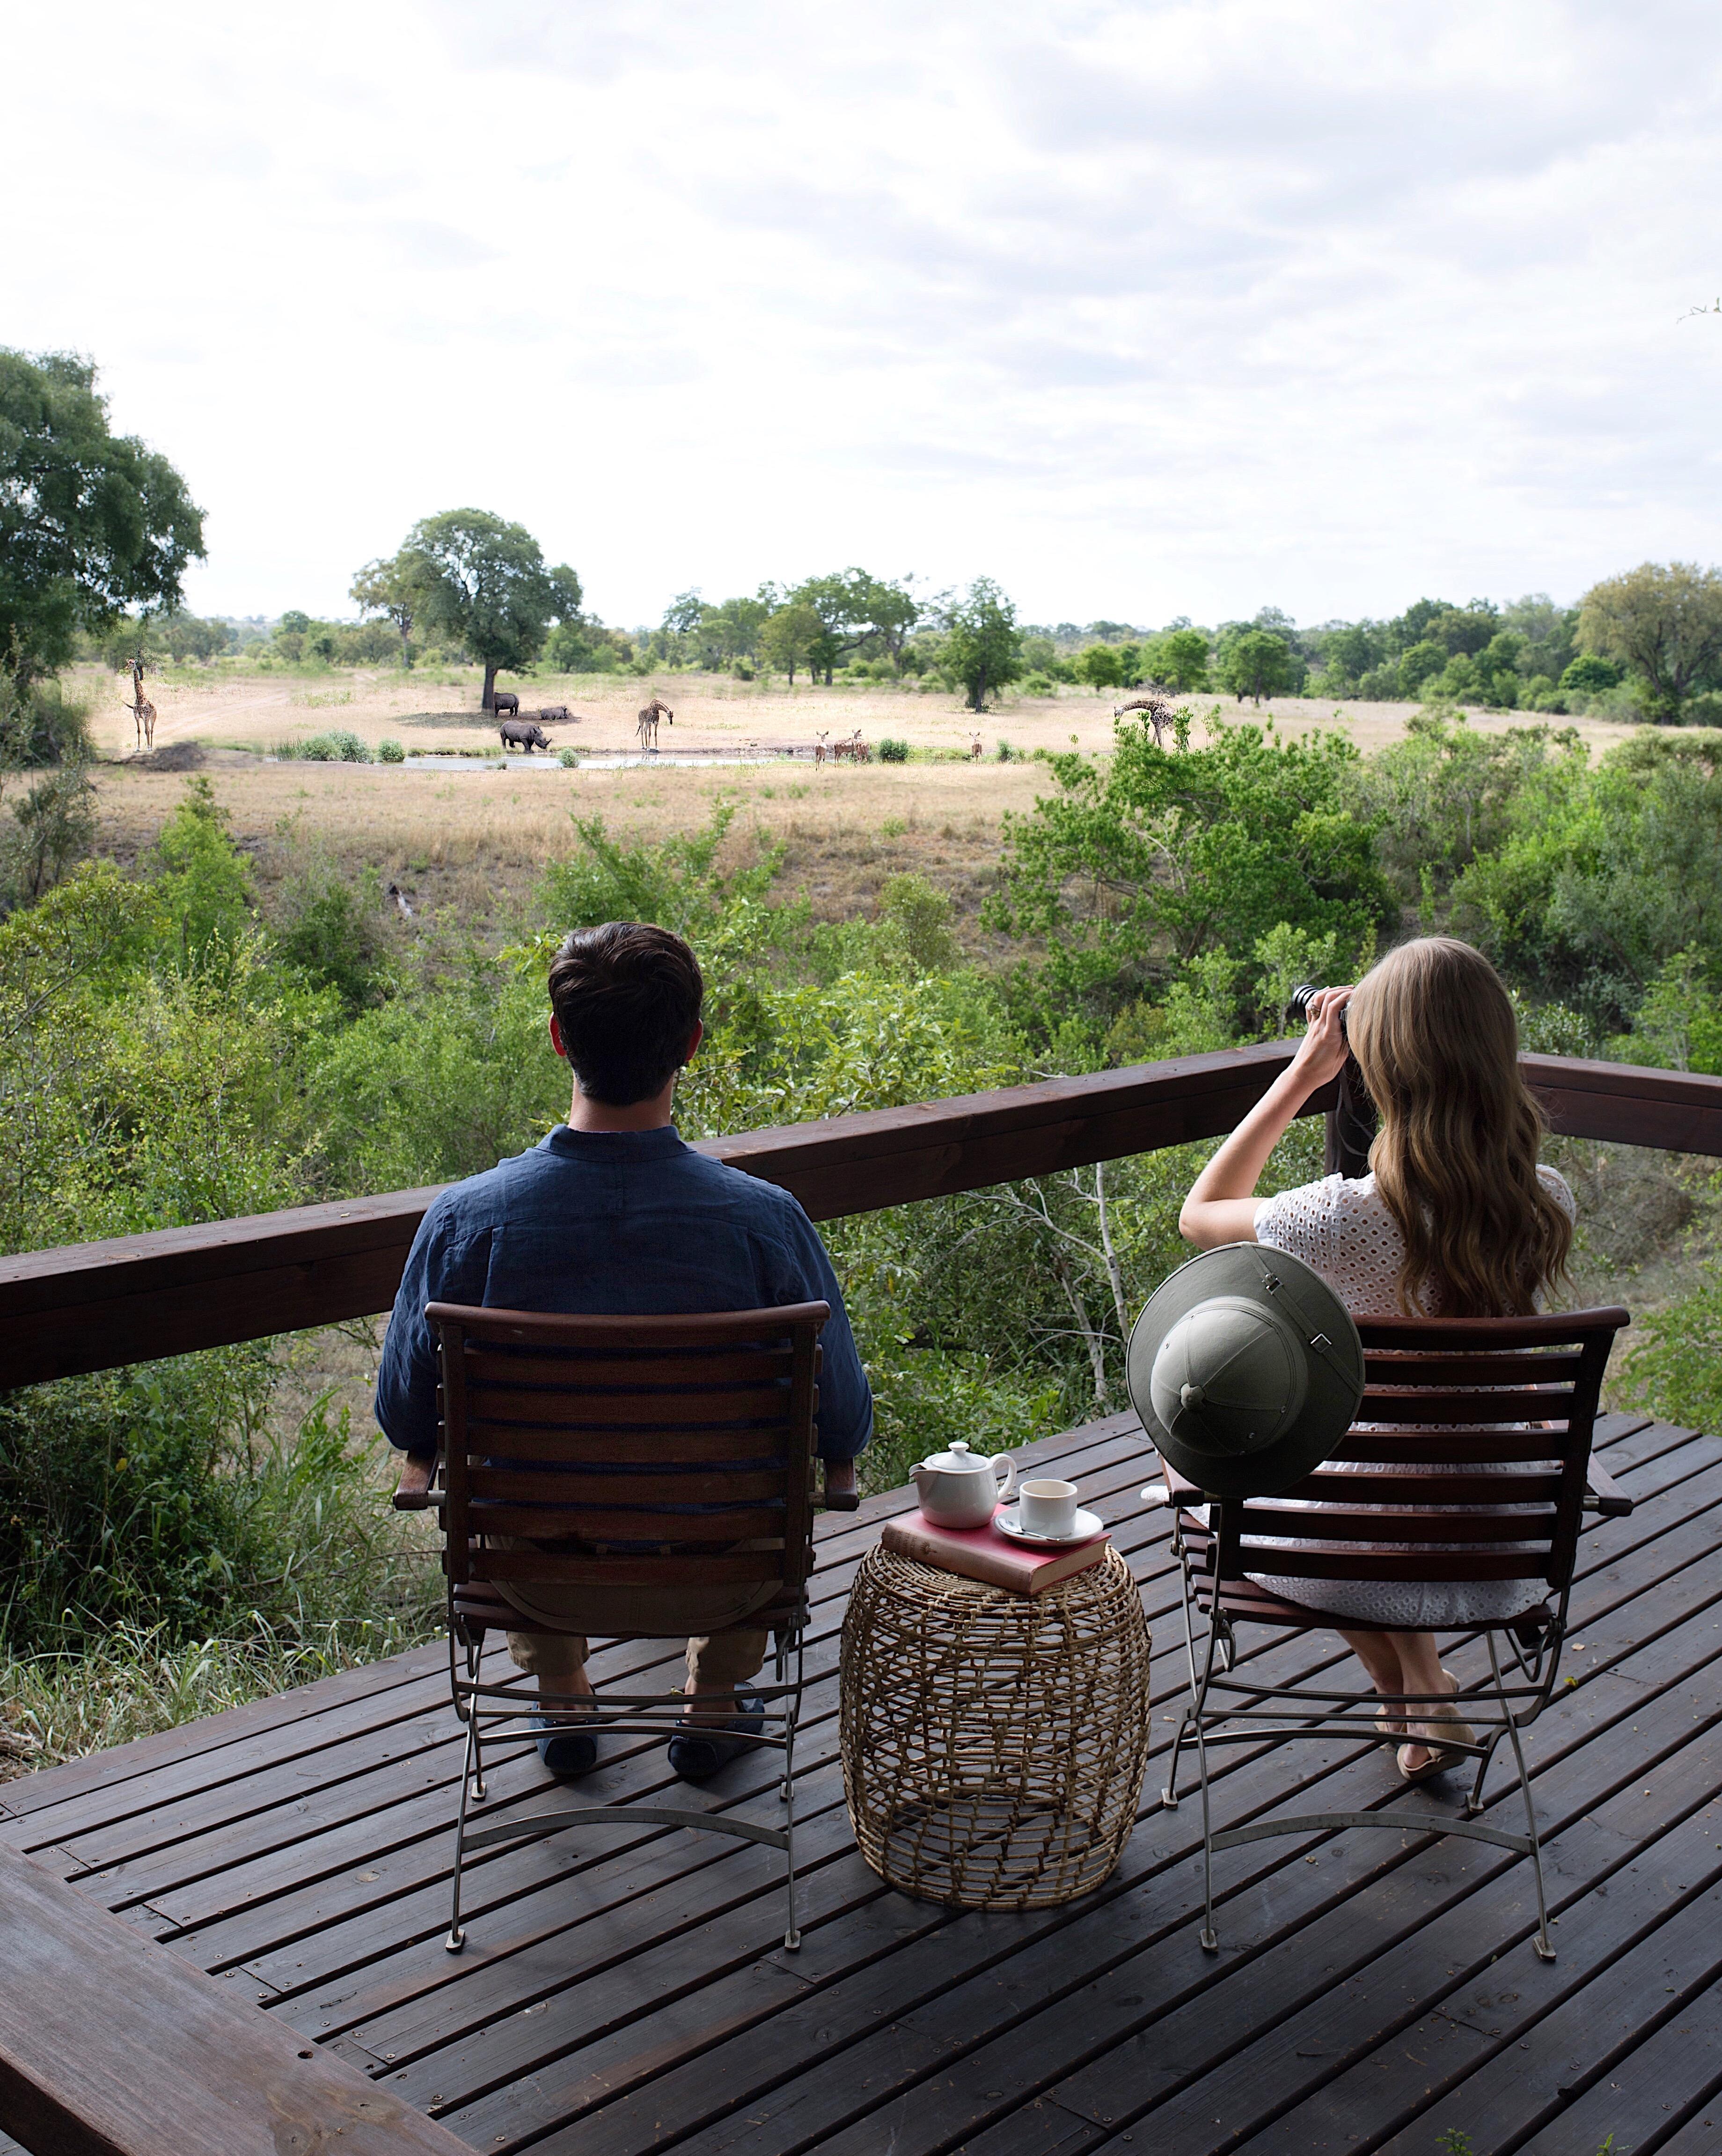 Stacie Flinner Safari South Africa